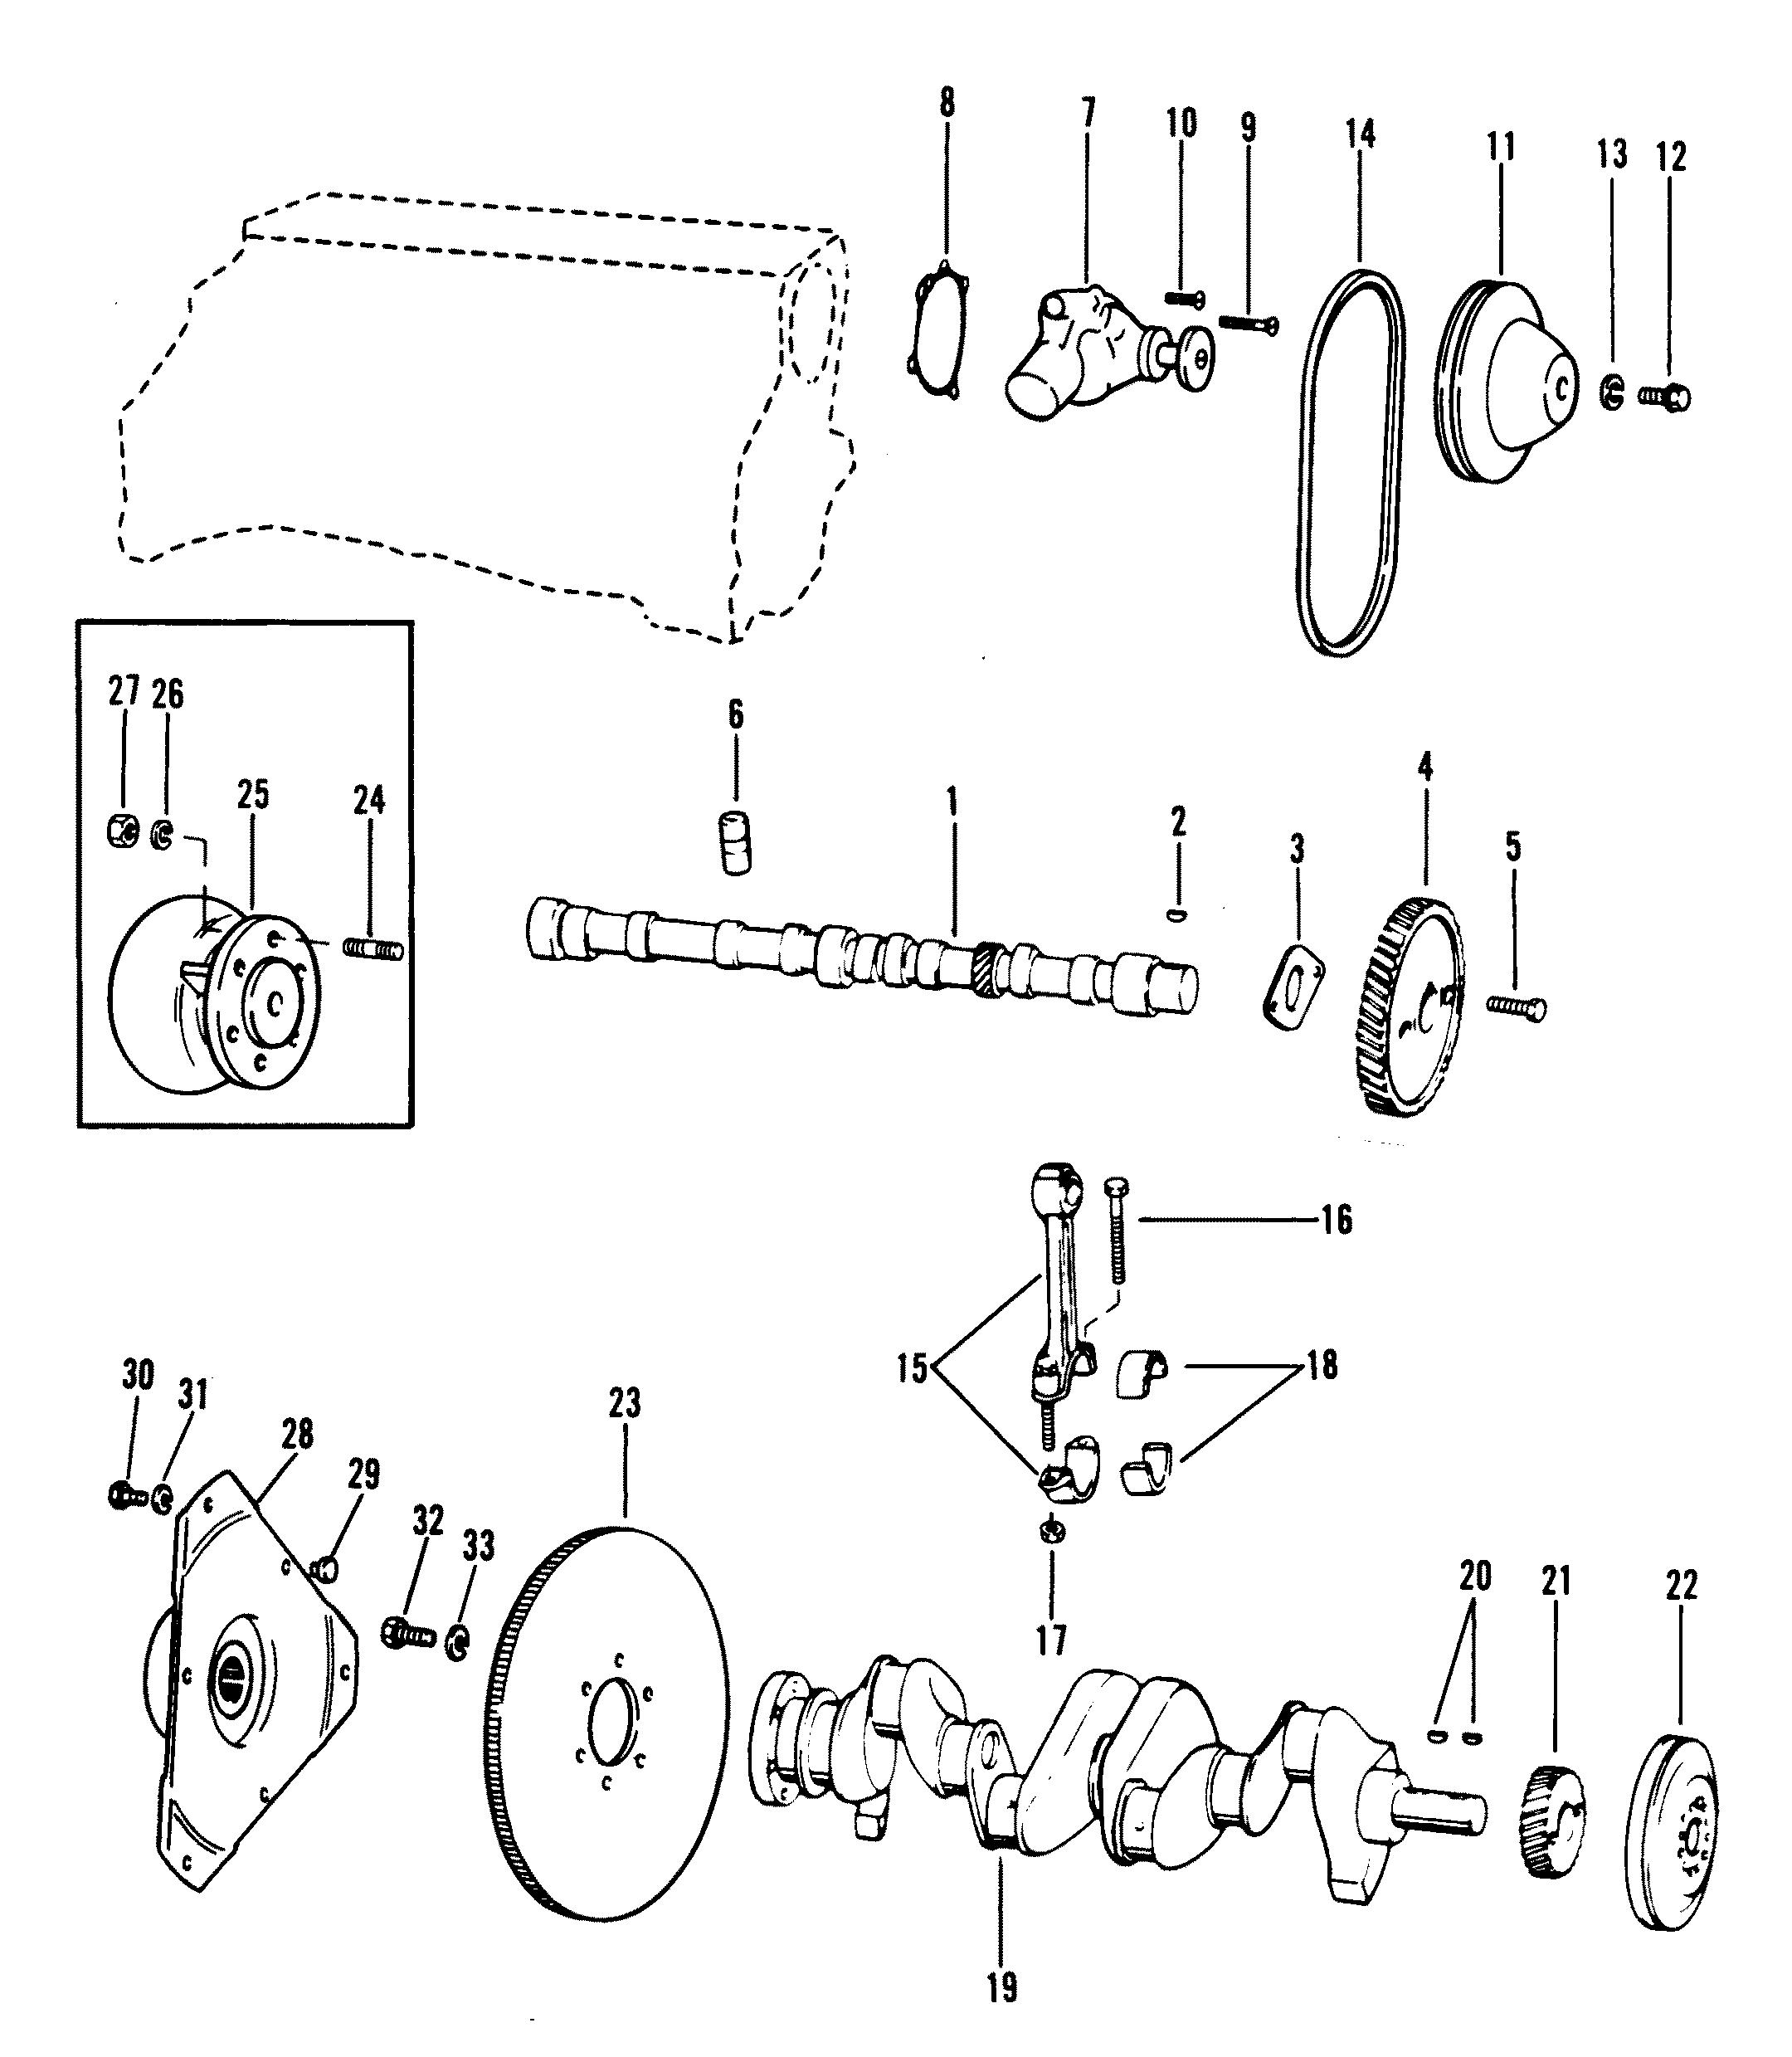 Contemporary mercruiser 140 engine diagram collection electrical rh piotomar info 3 0 mercruiser engine wiring diagram 5 7